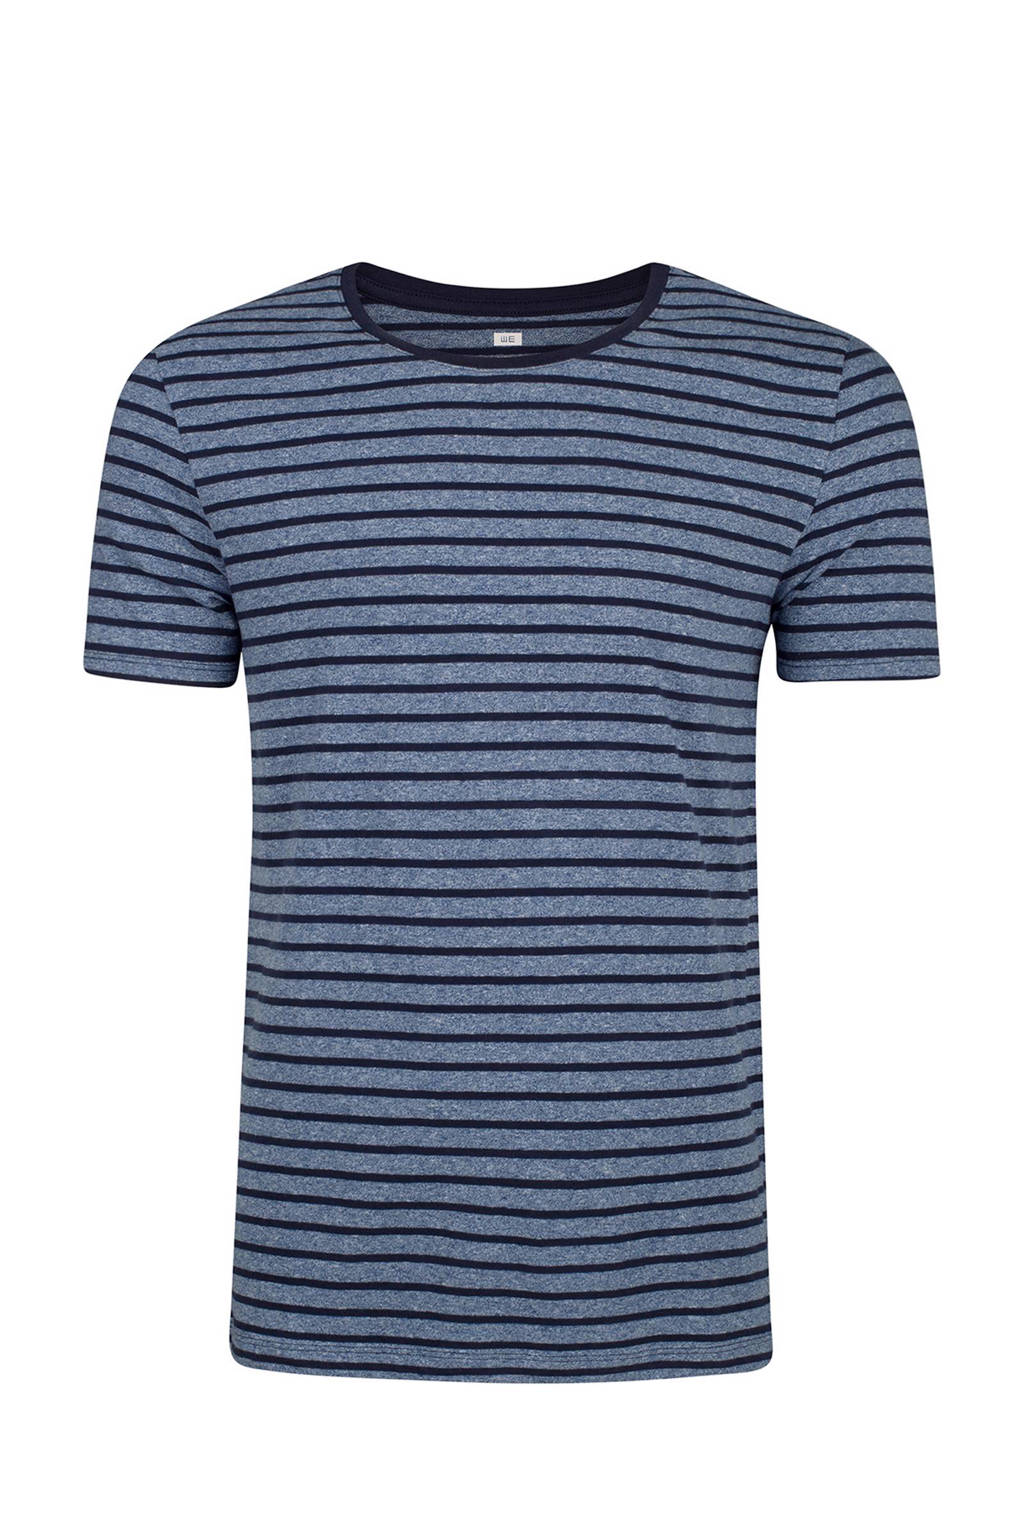 WE Fashion gestreept T-shirt, Blauw